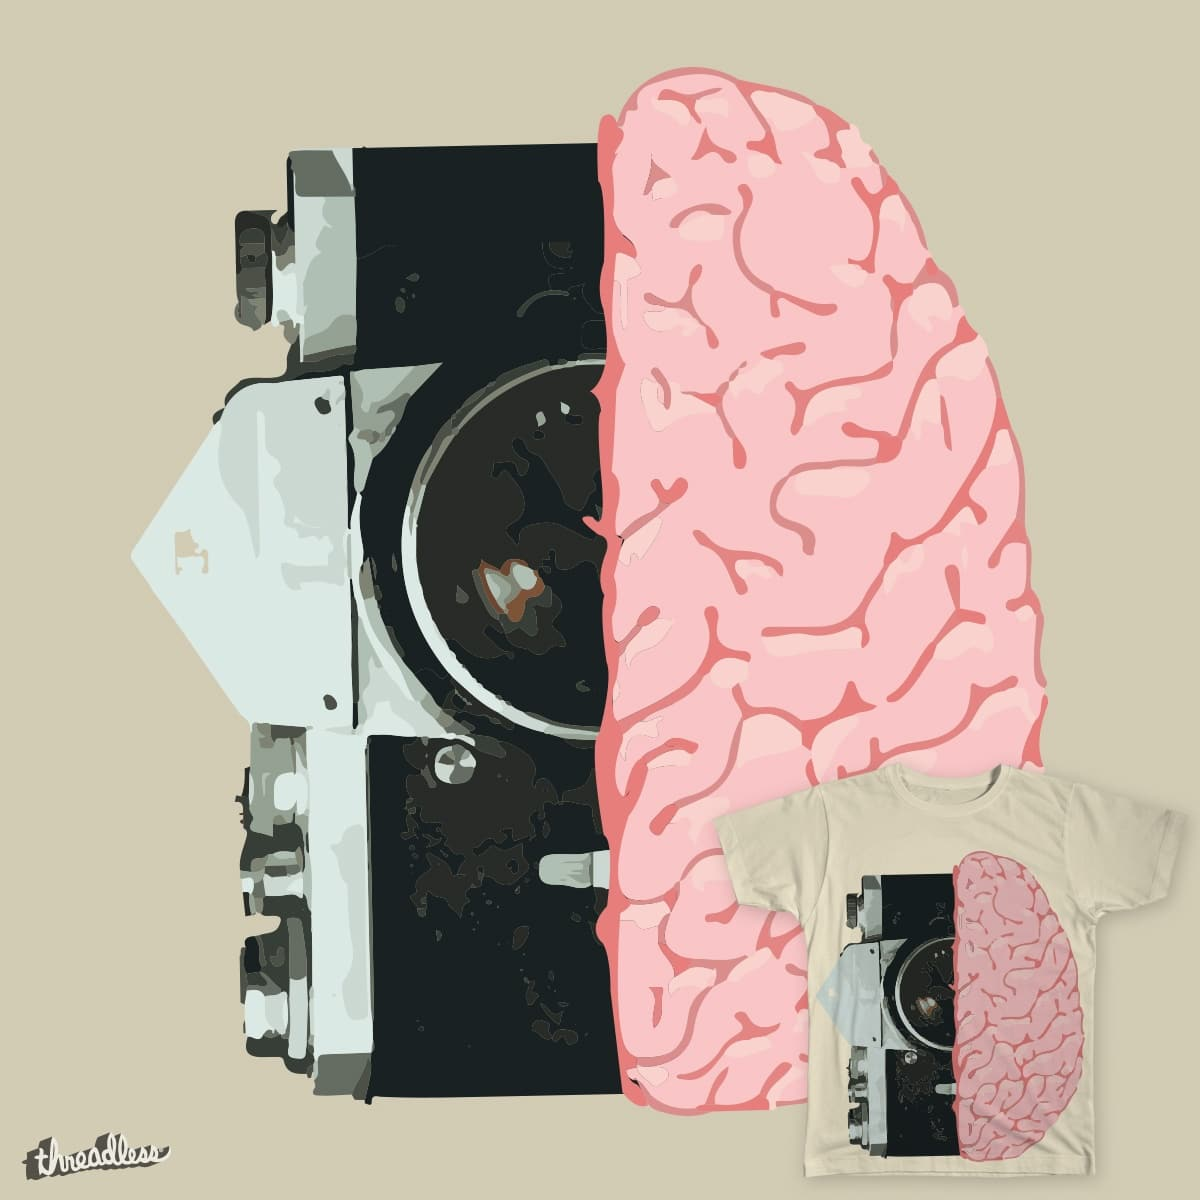 Camera Brain by SomthingBorealis on Threadless